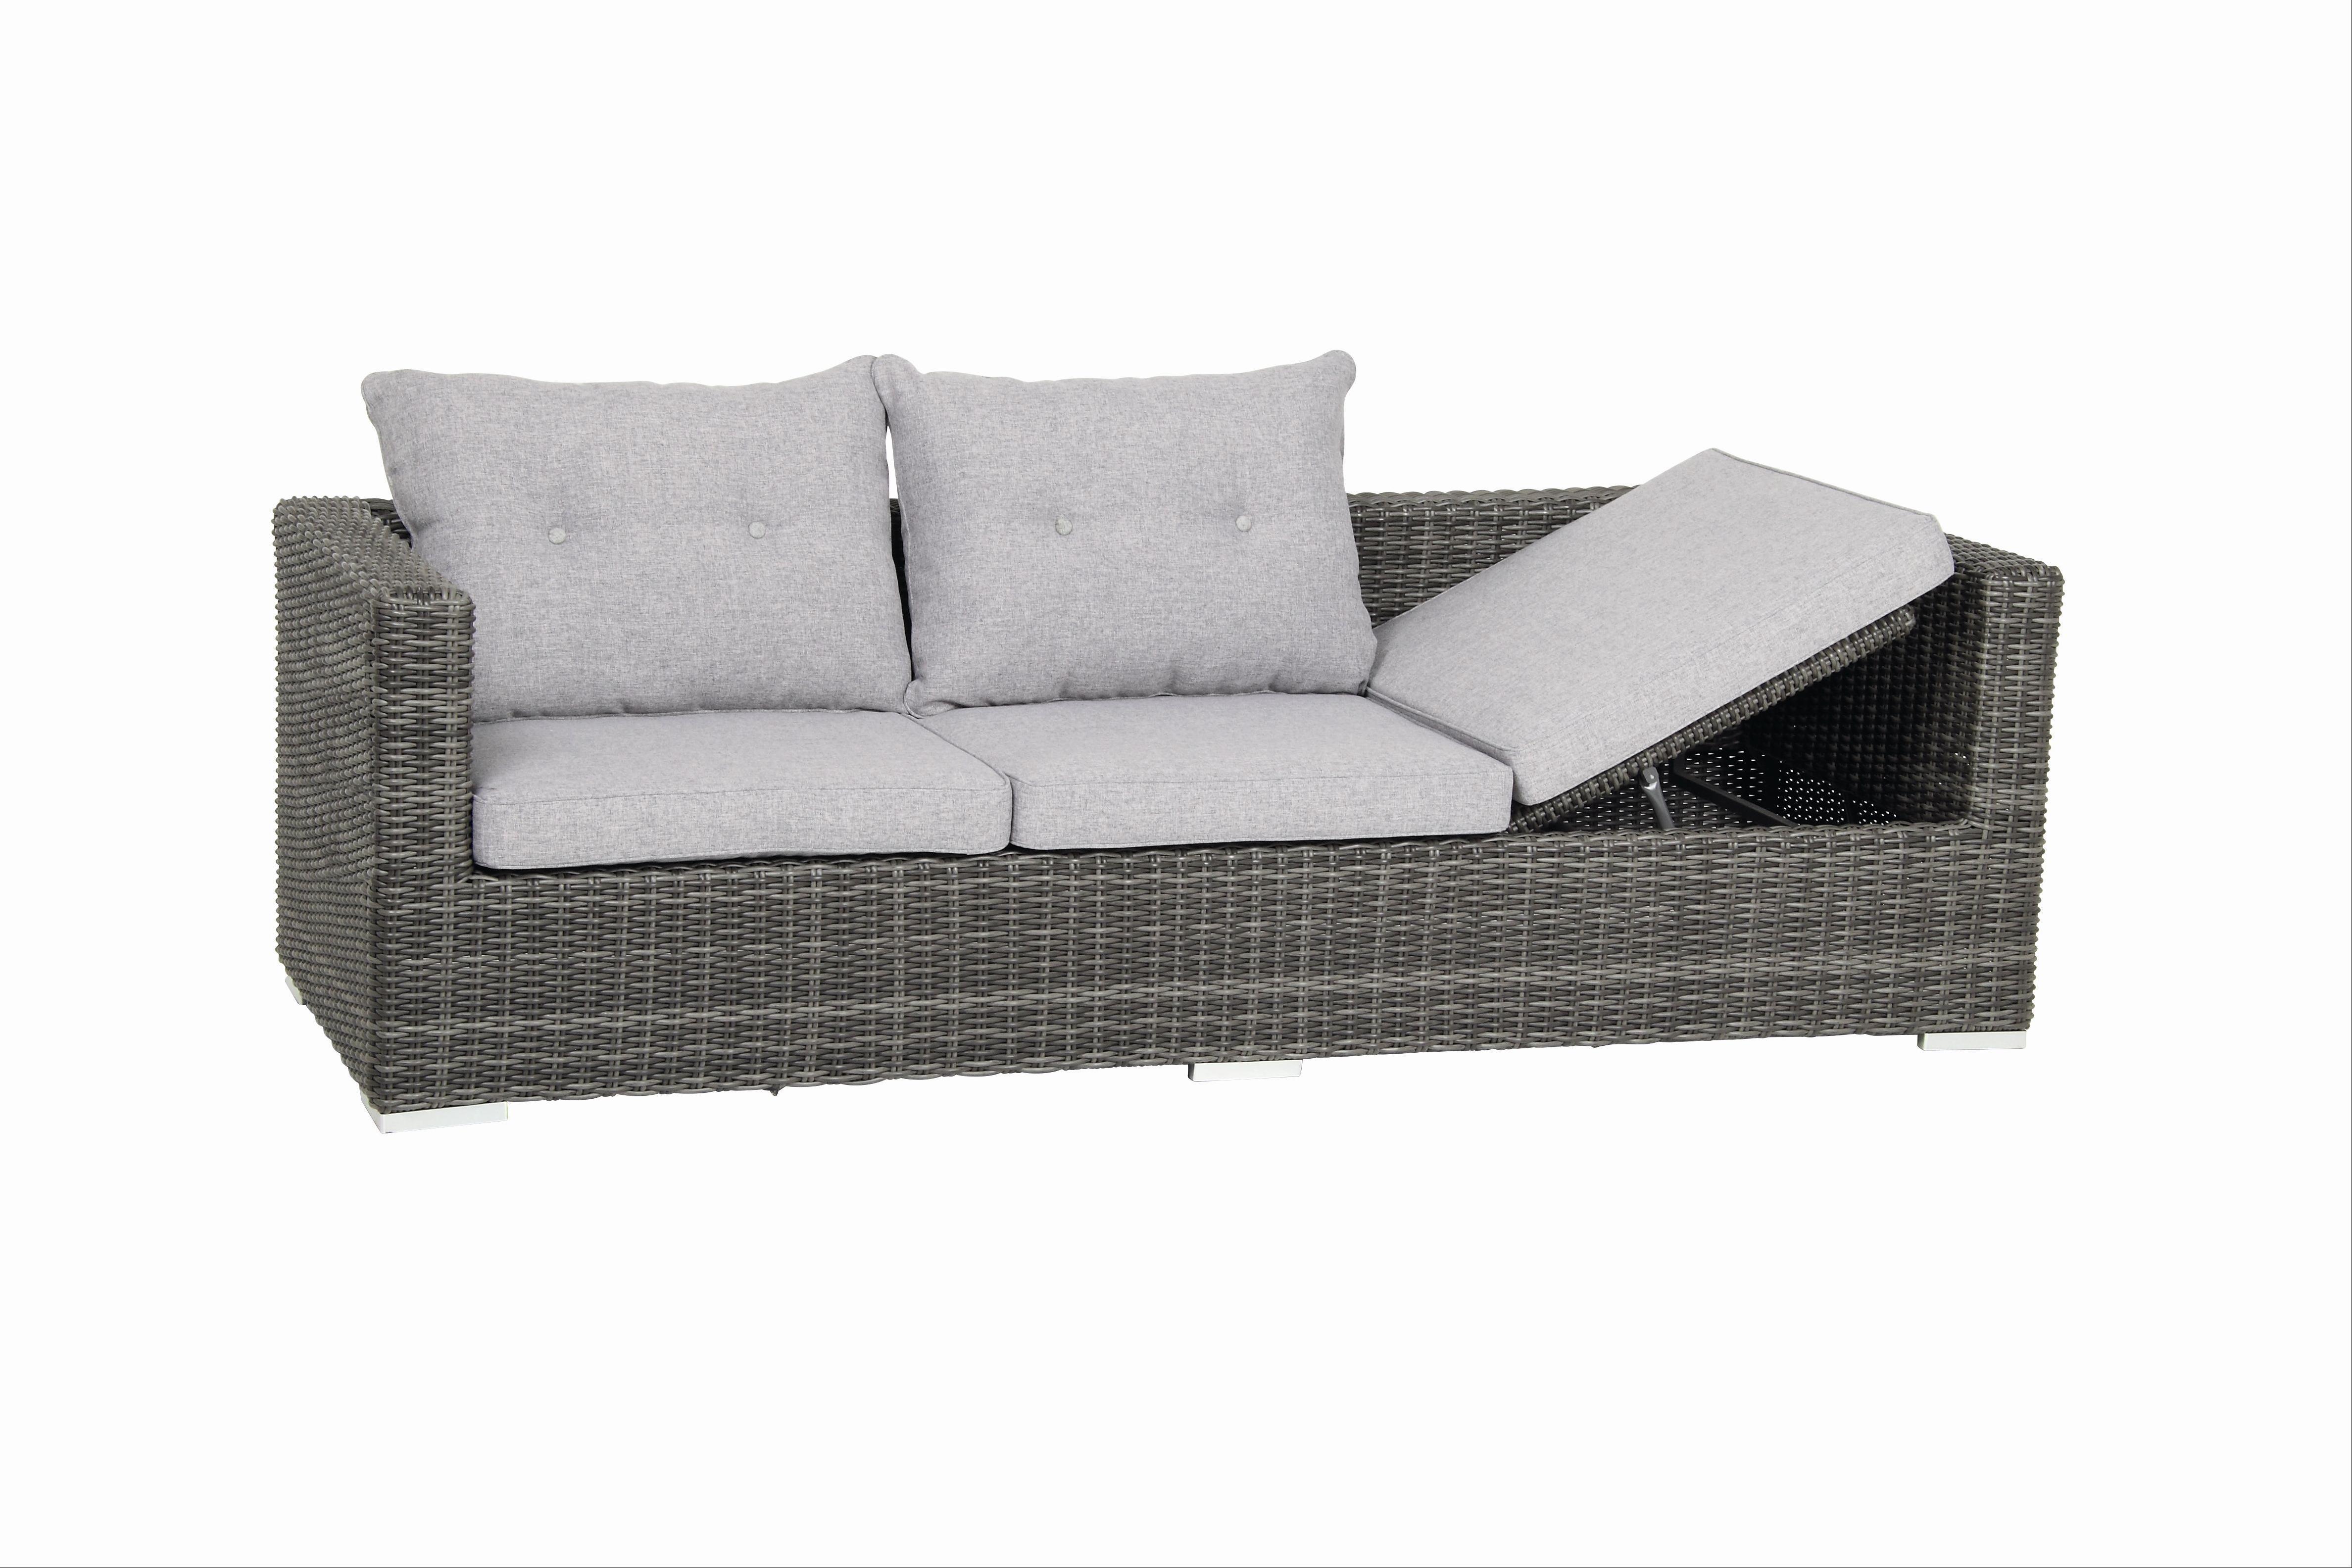 Gartenbank / Gartensofa 3-Sitzer acamp Sicilia Polyrattan grau Bild 2